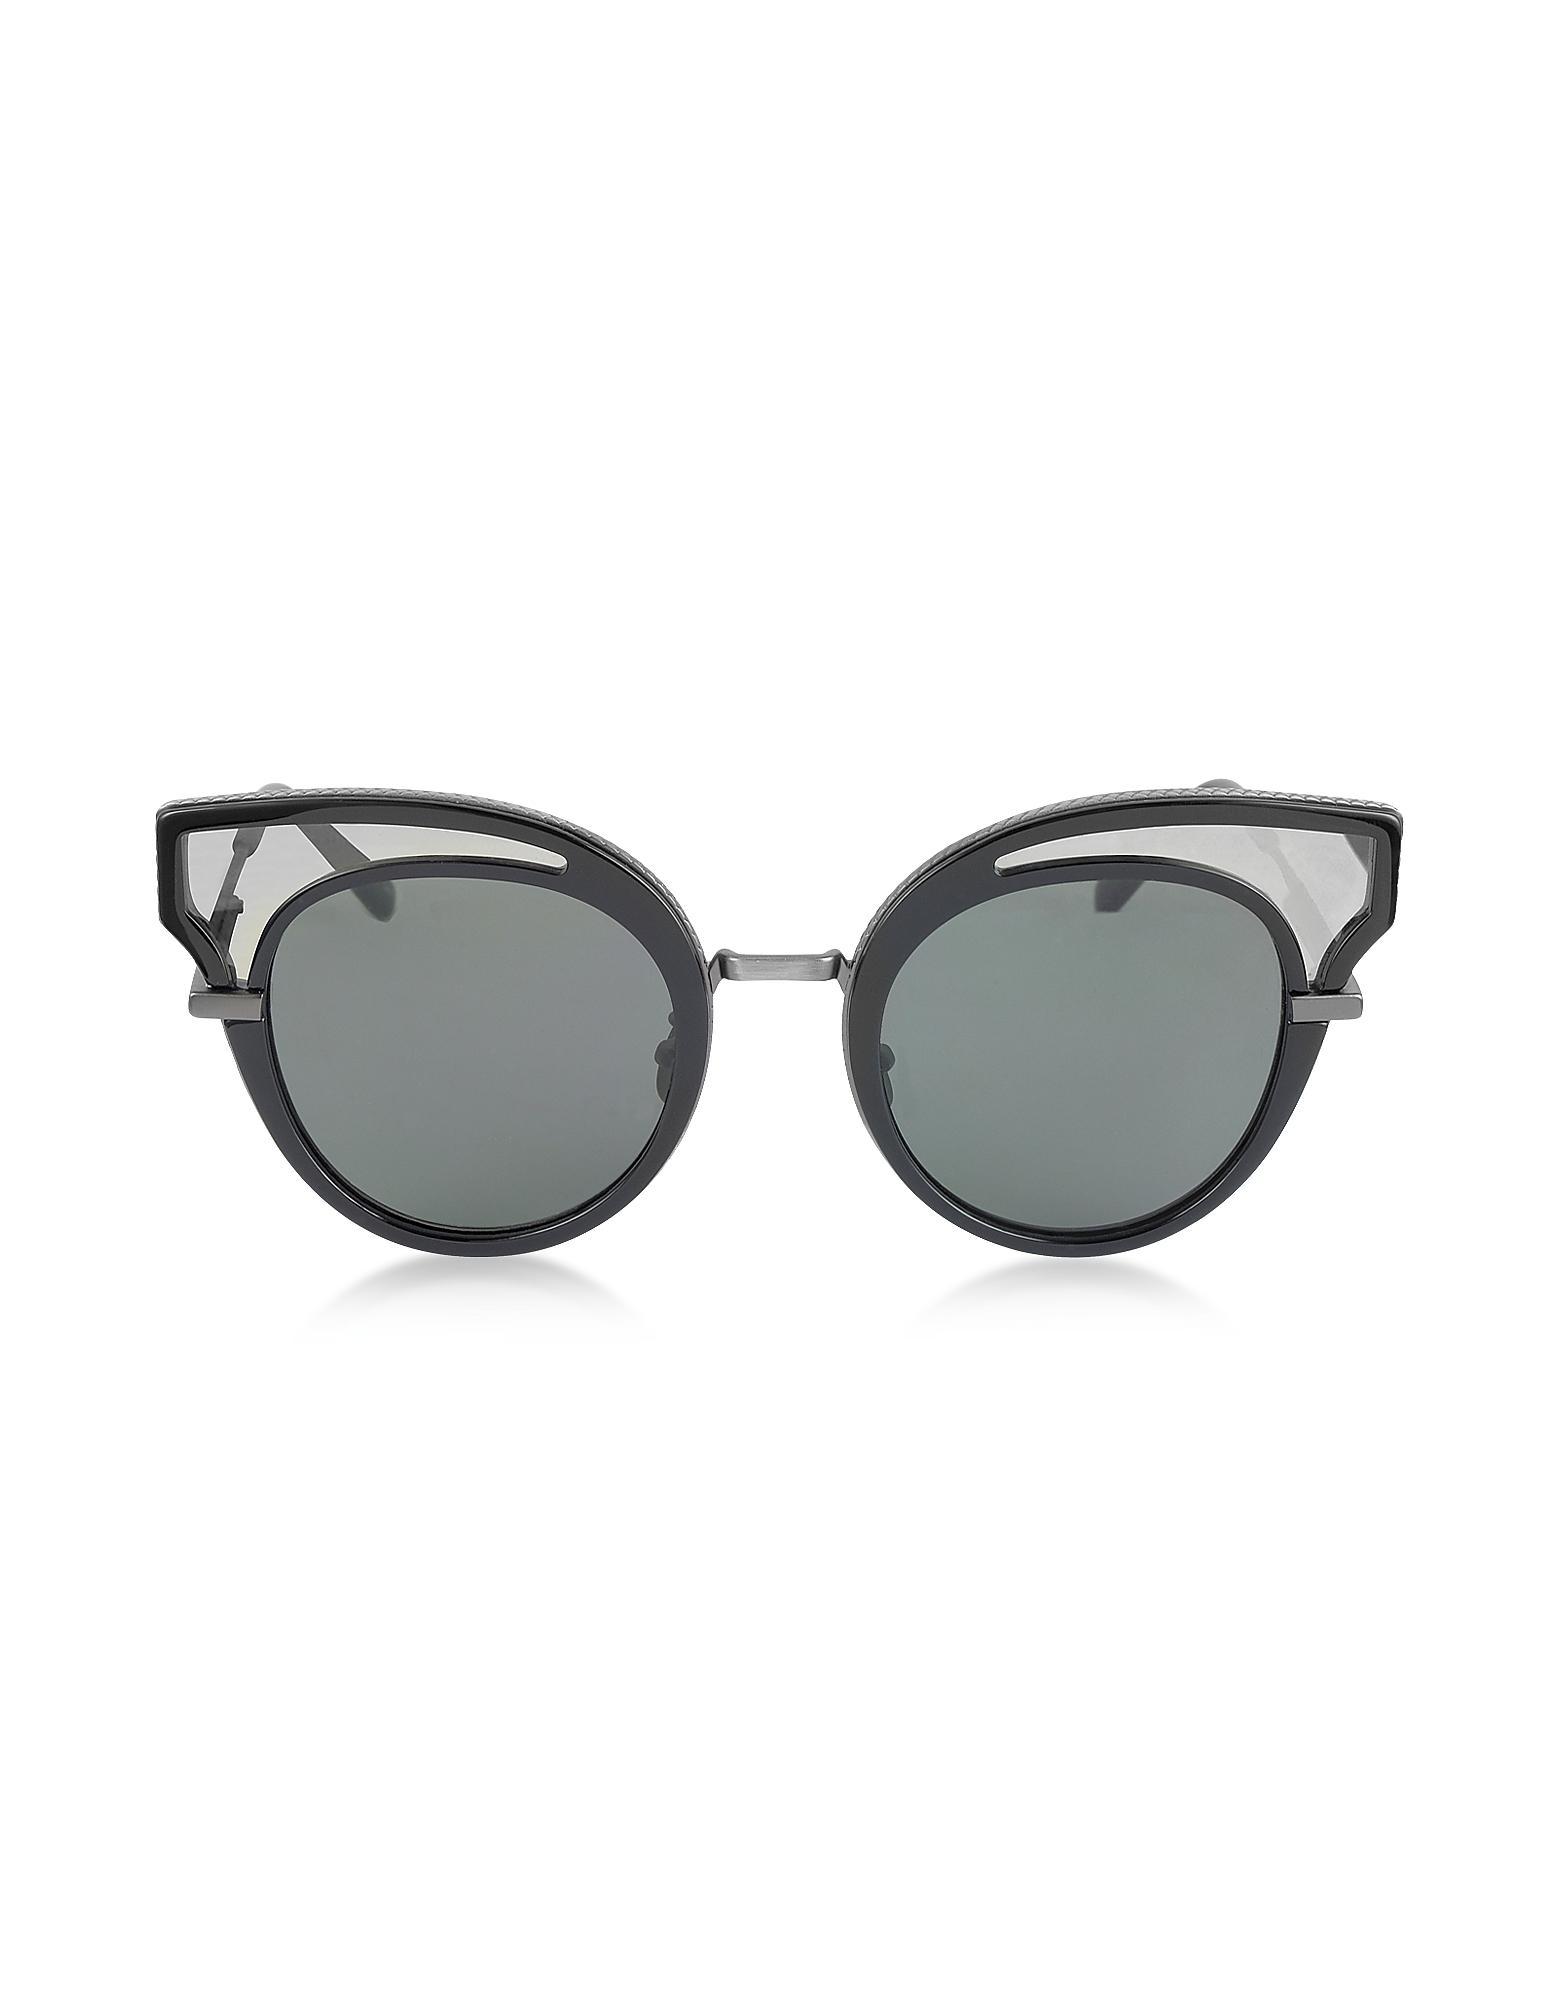 d90f3828154e4 Lyst - Bottega Veneta Bv0094s Acetate Cat Eye Women s Sunglasses in ...